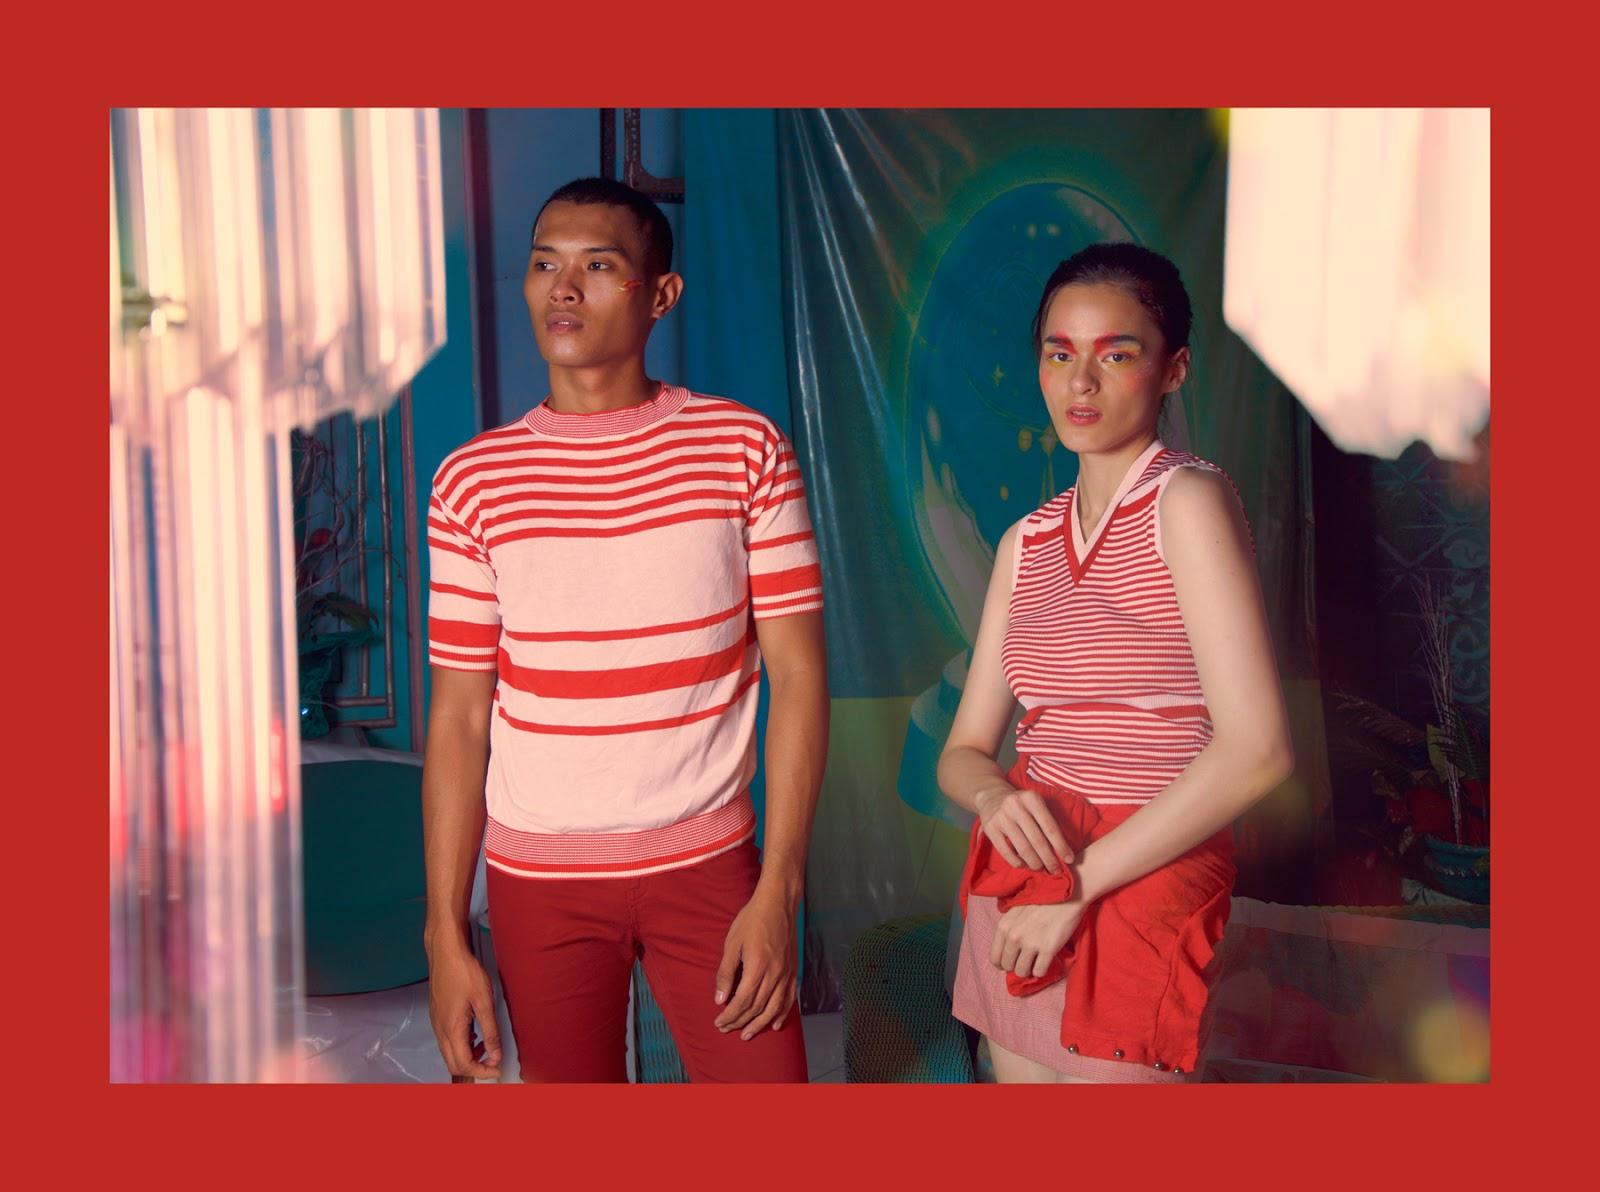 colorful rainbow fashion spread photography magazine haqi cahya haqeeu devona nathan seoul tokyo korean model